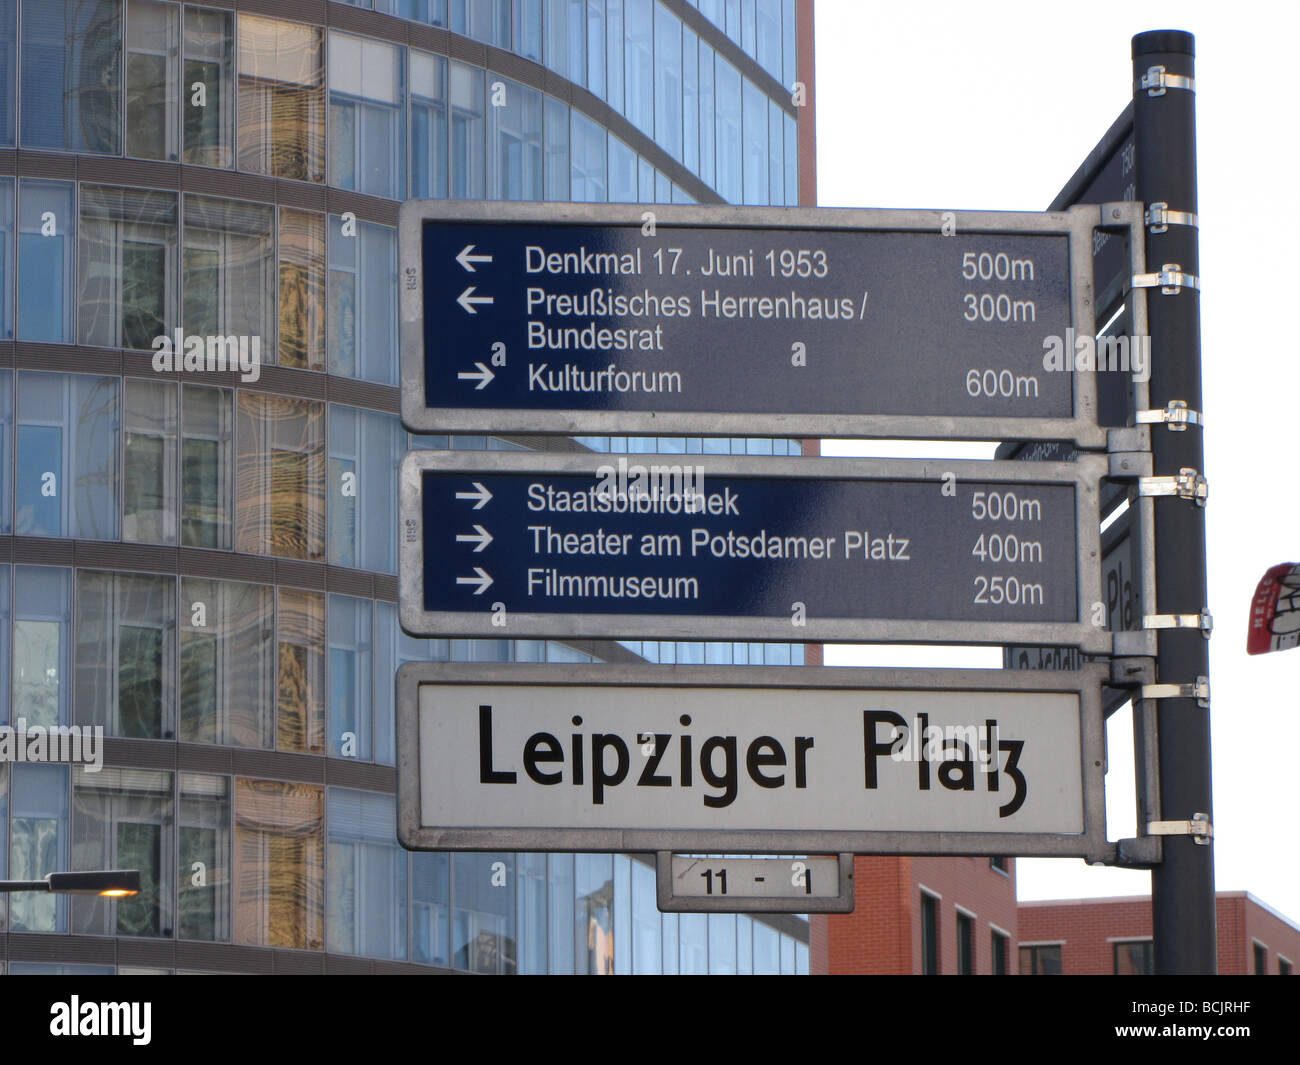 Deutschland Berlin Sehenswertes Mai 09 Stockbild